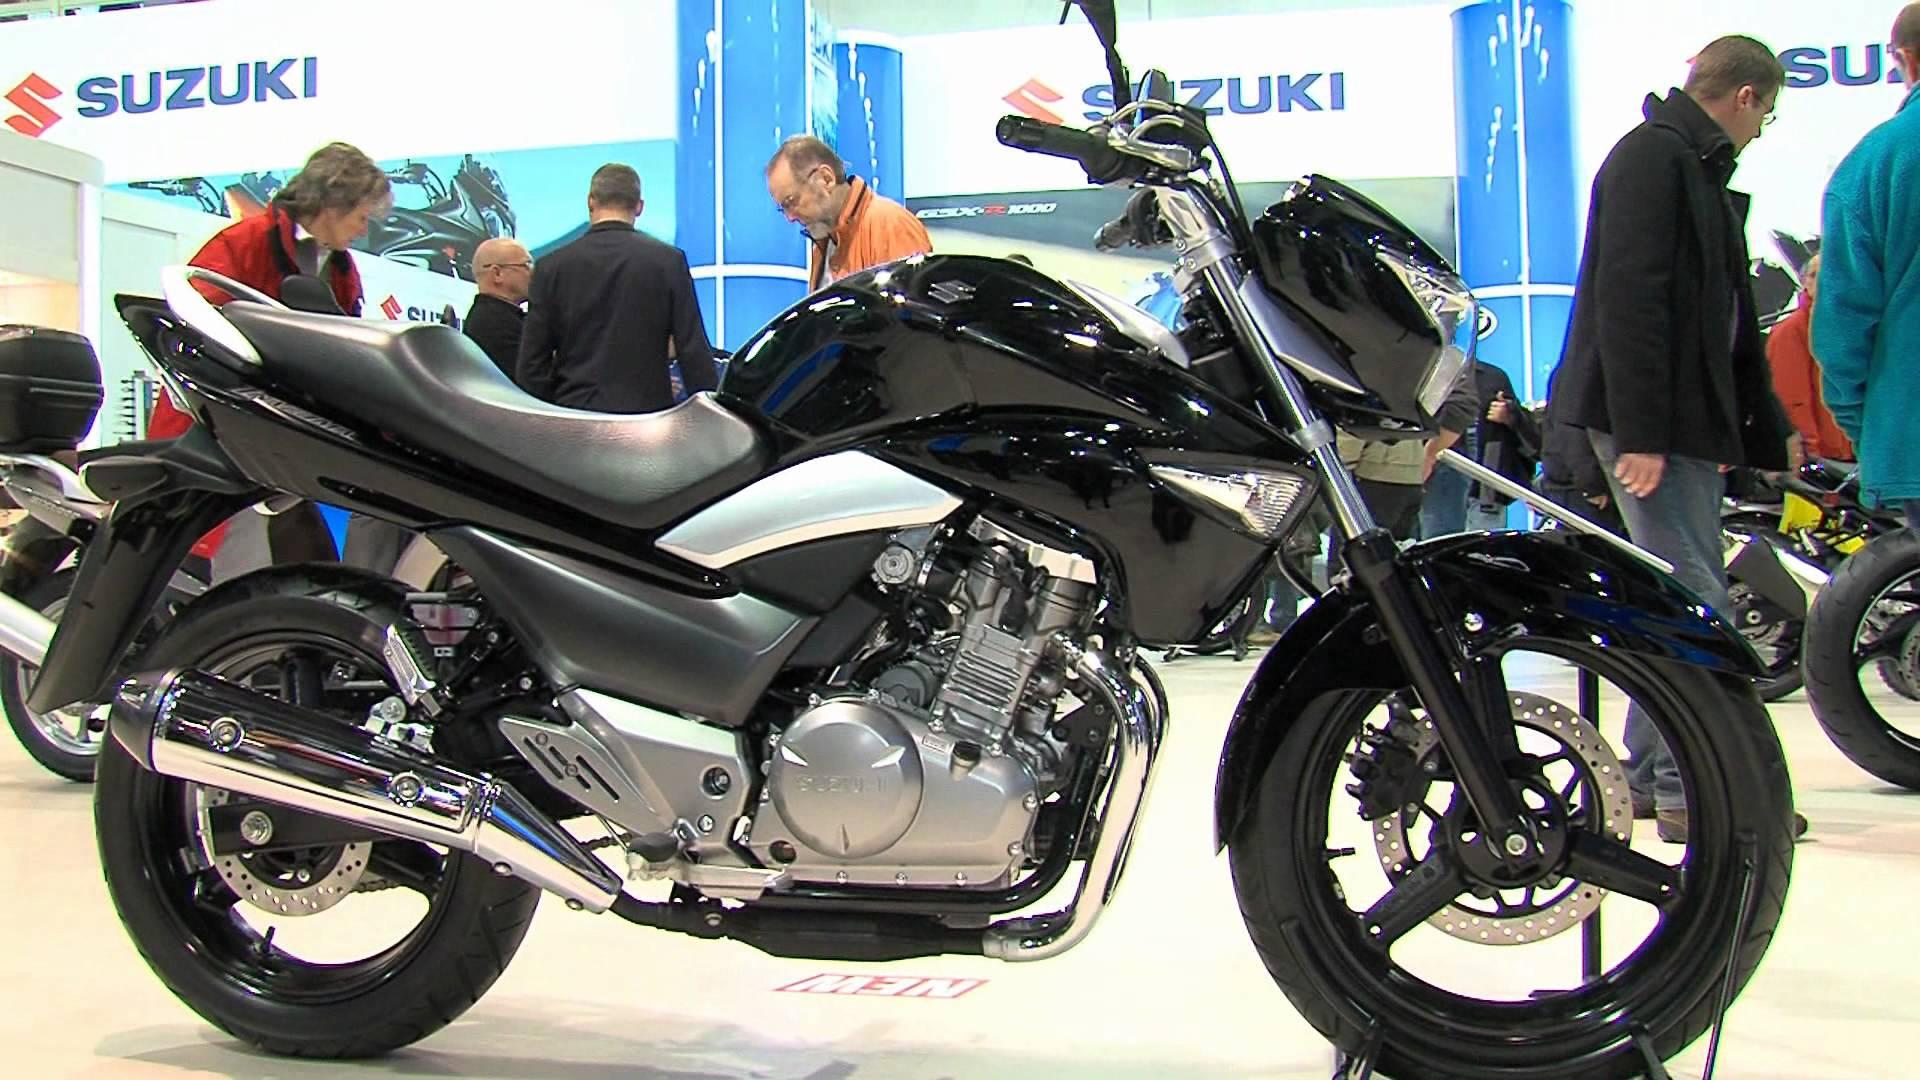 Suzuki GSX250R Scooter Motorcycle All-terrain vehicle, suzuki, exhaust  System, scooter png   PNGEgg